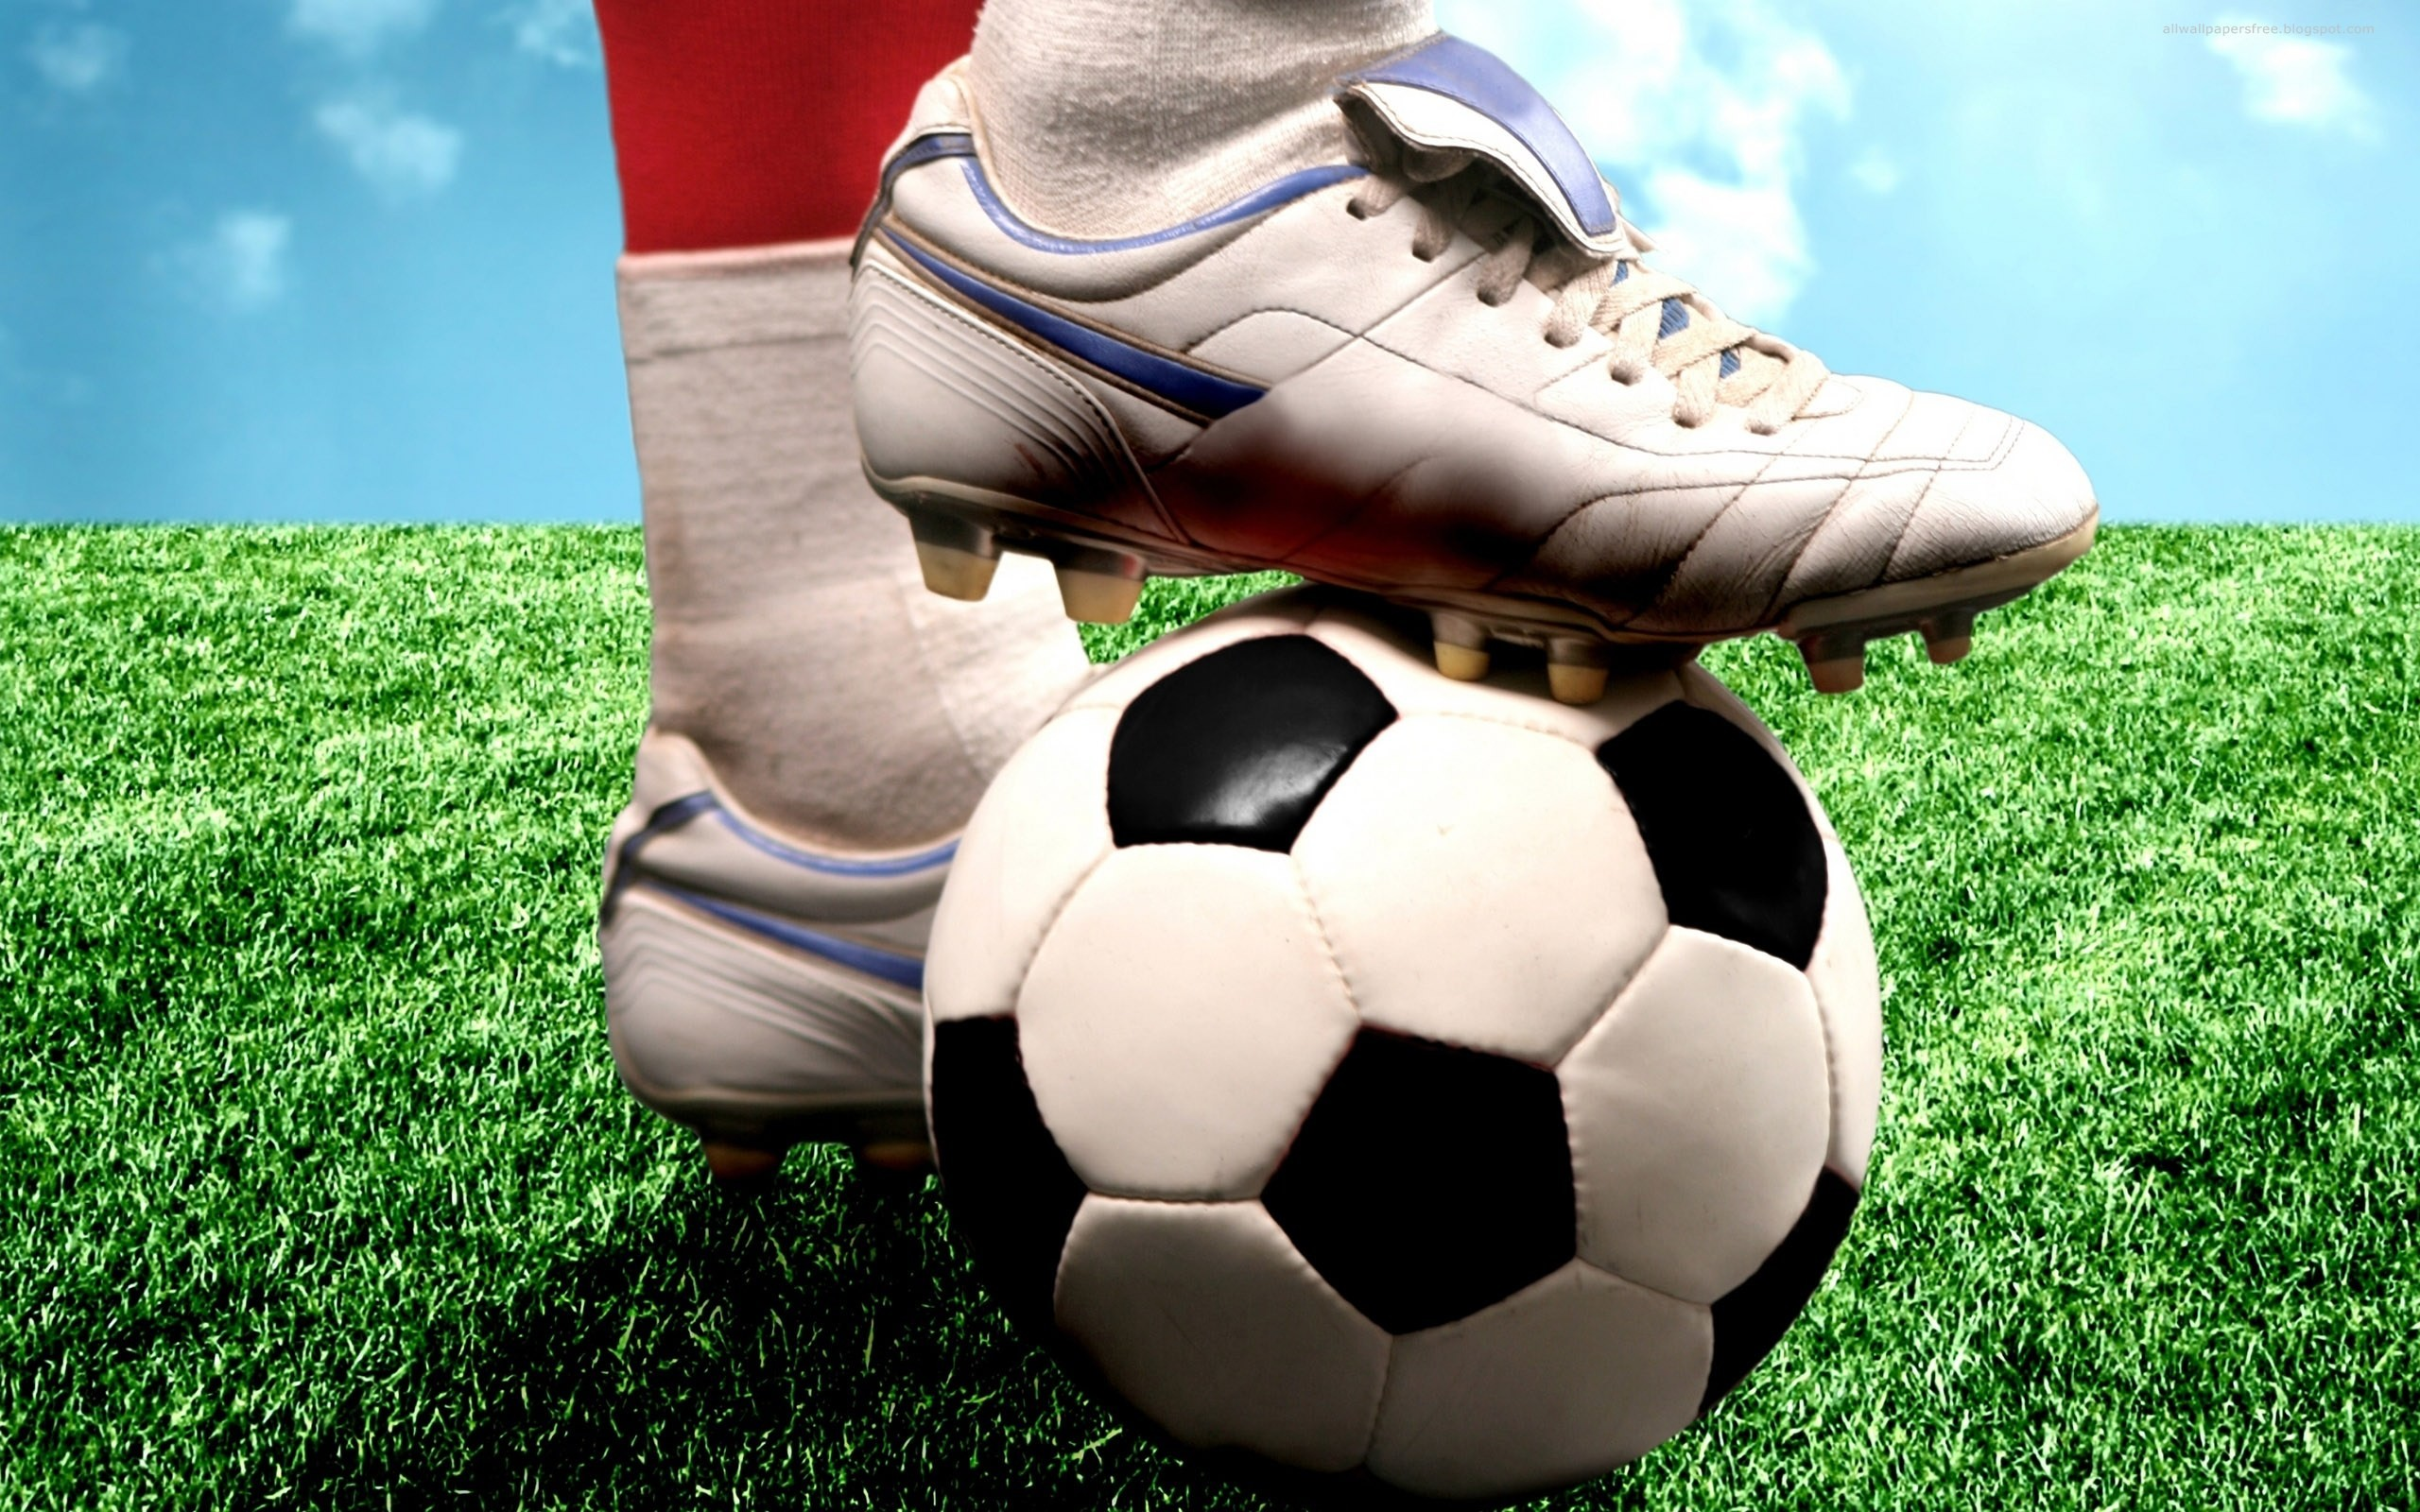 Cool Football Wallpaper | HD Wallpapers | Pinterest | Football wallpaper  and Wallpaper